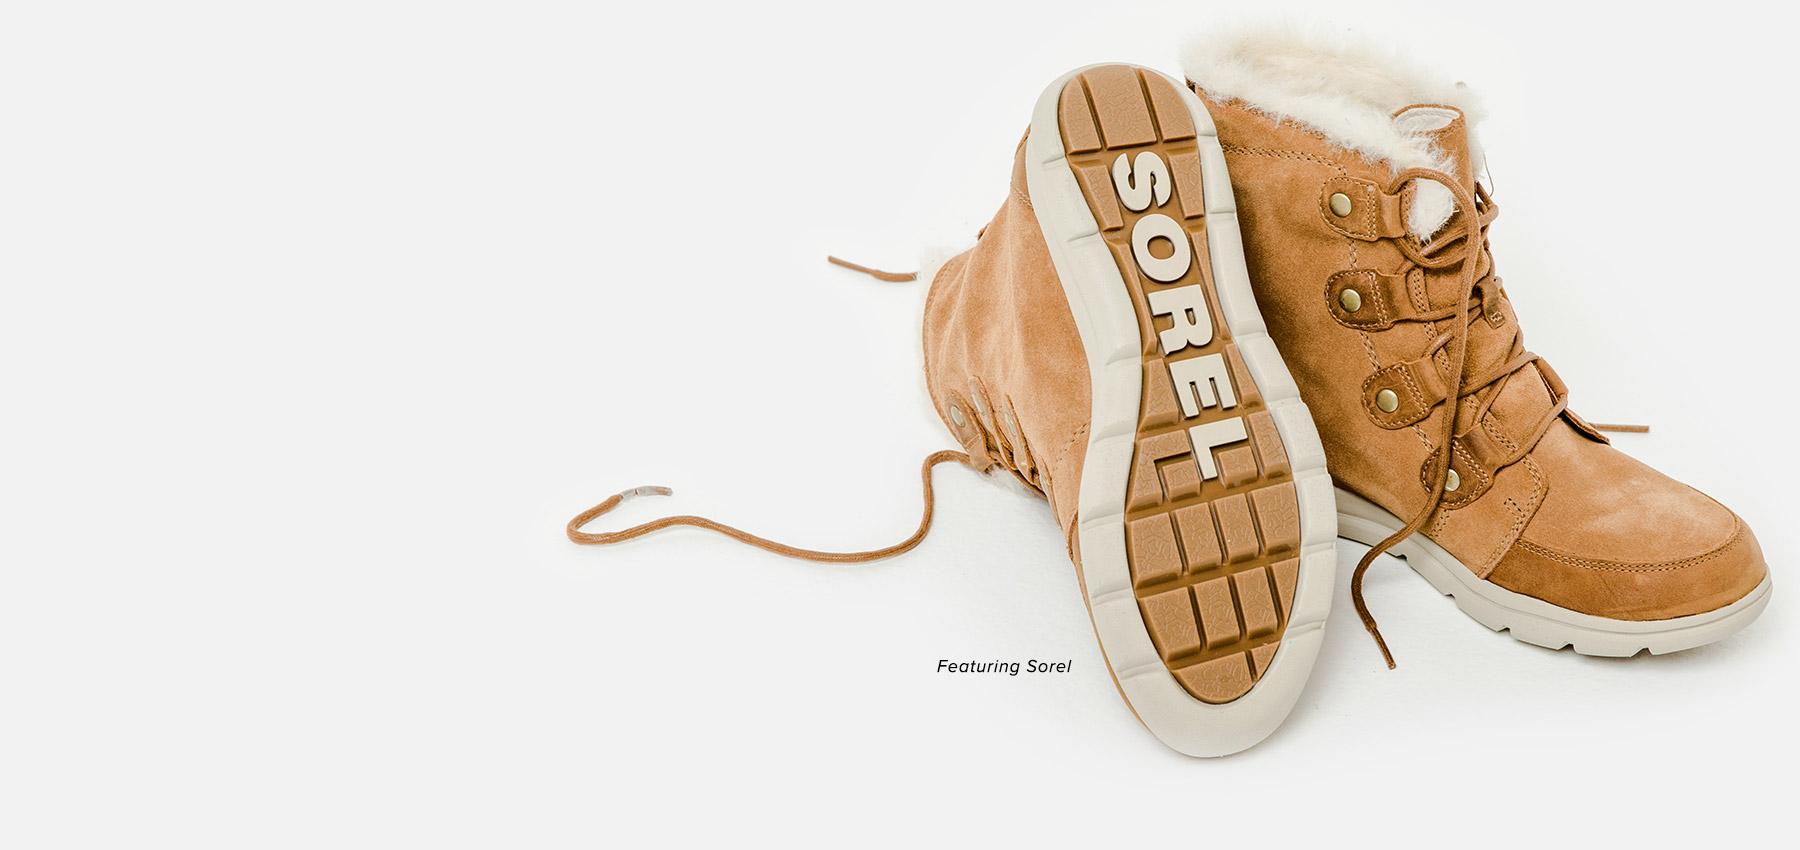 A pair of Women's Sorel boots